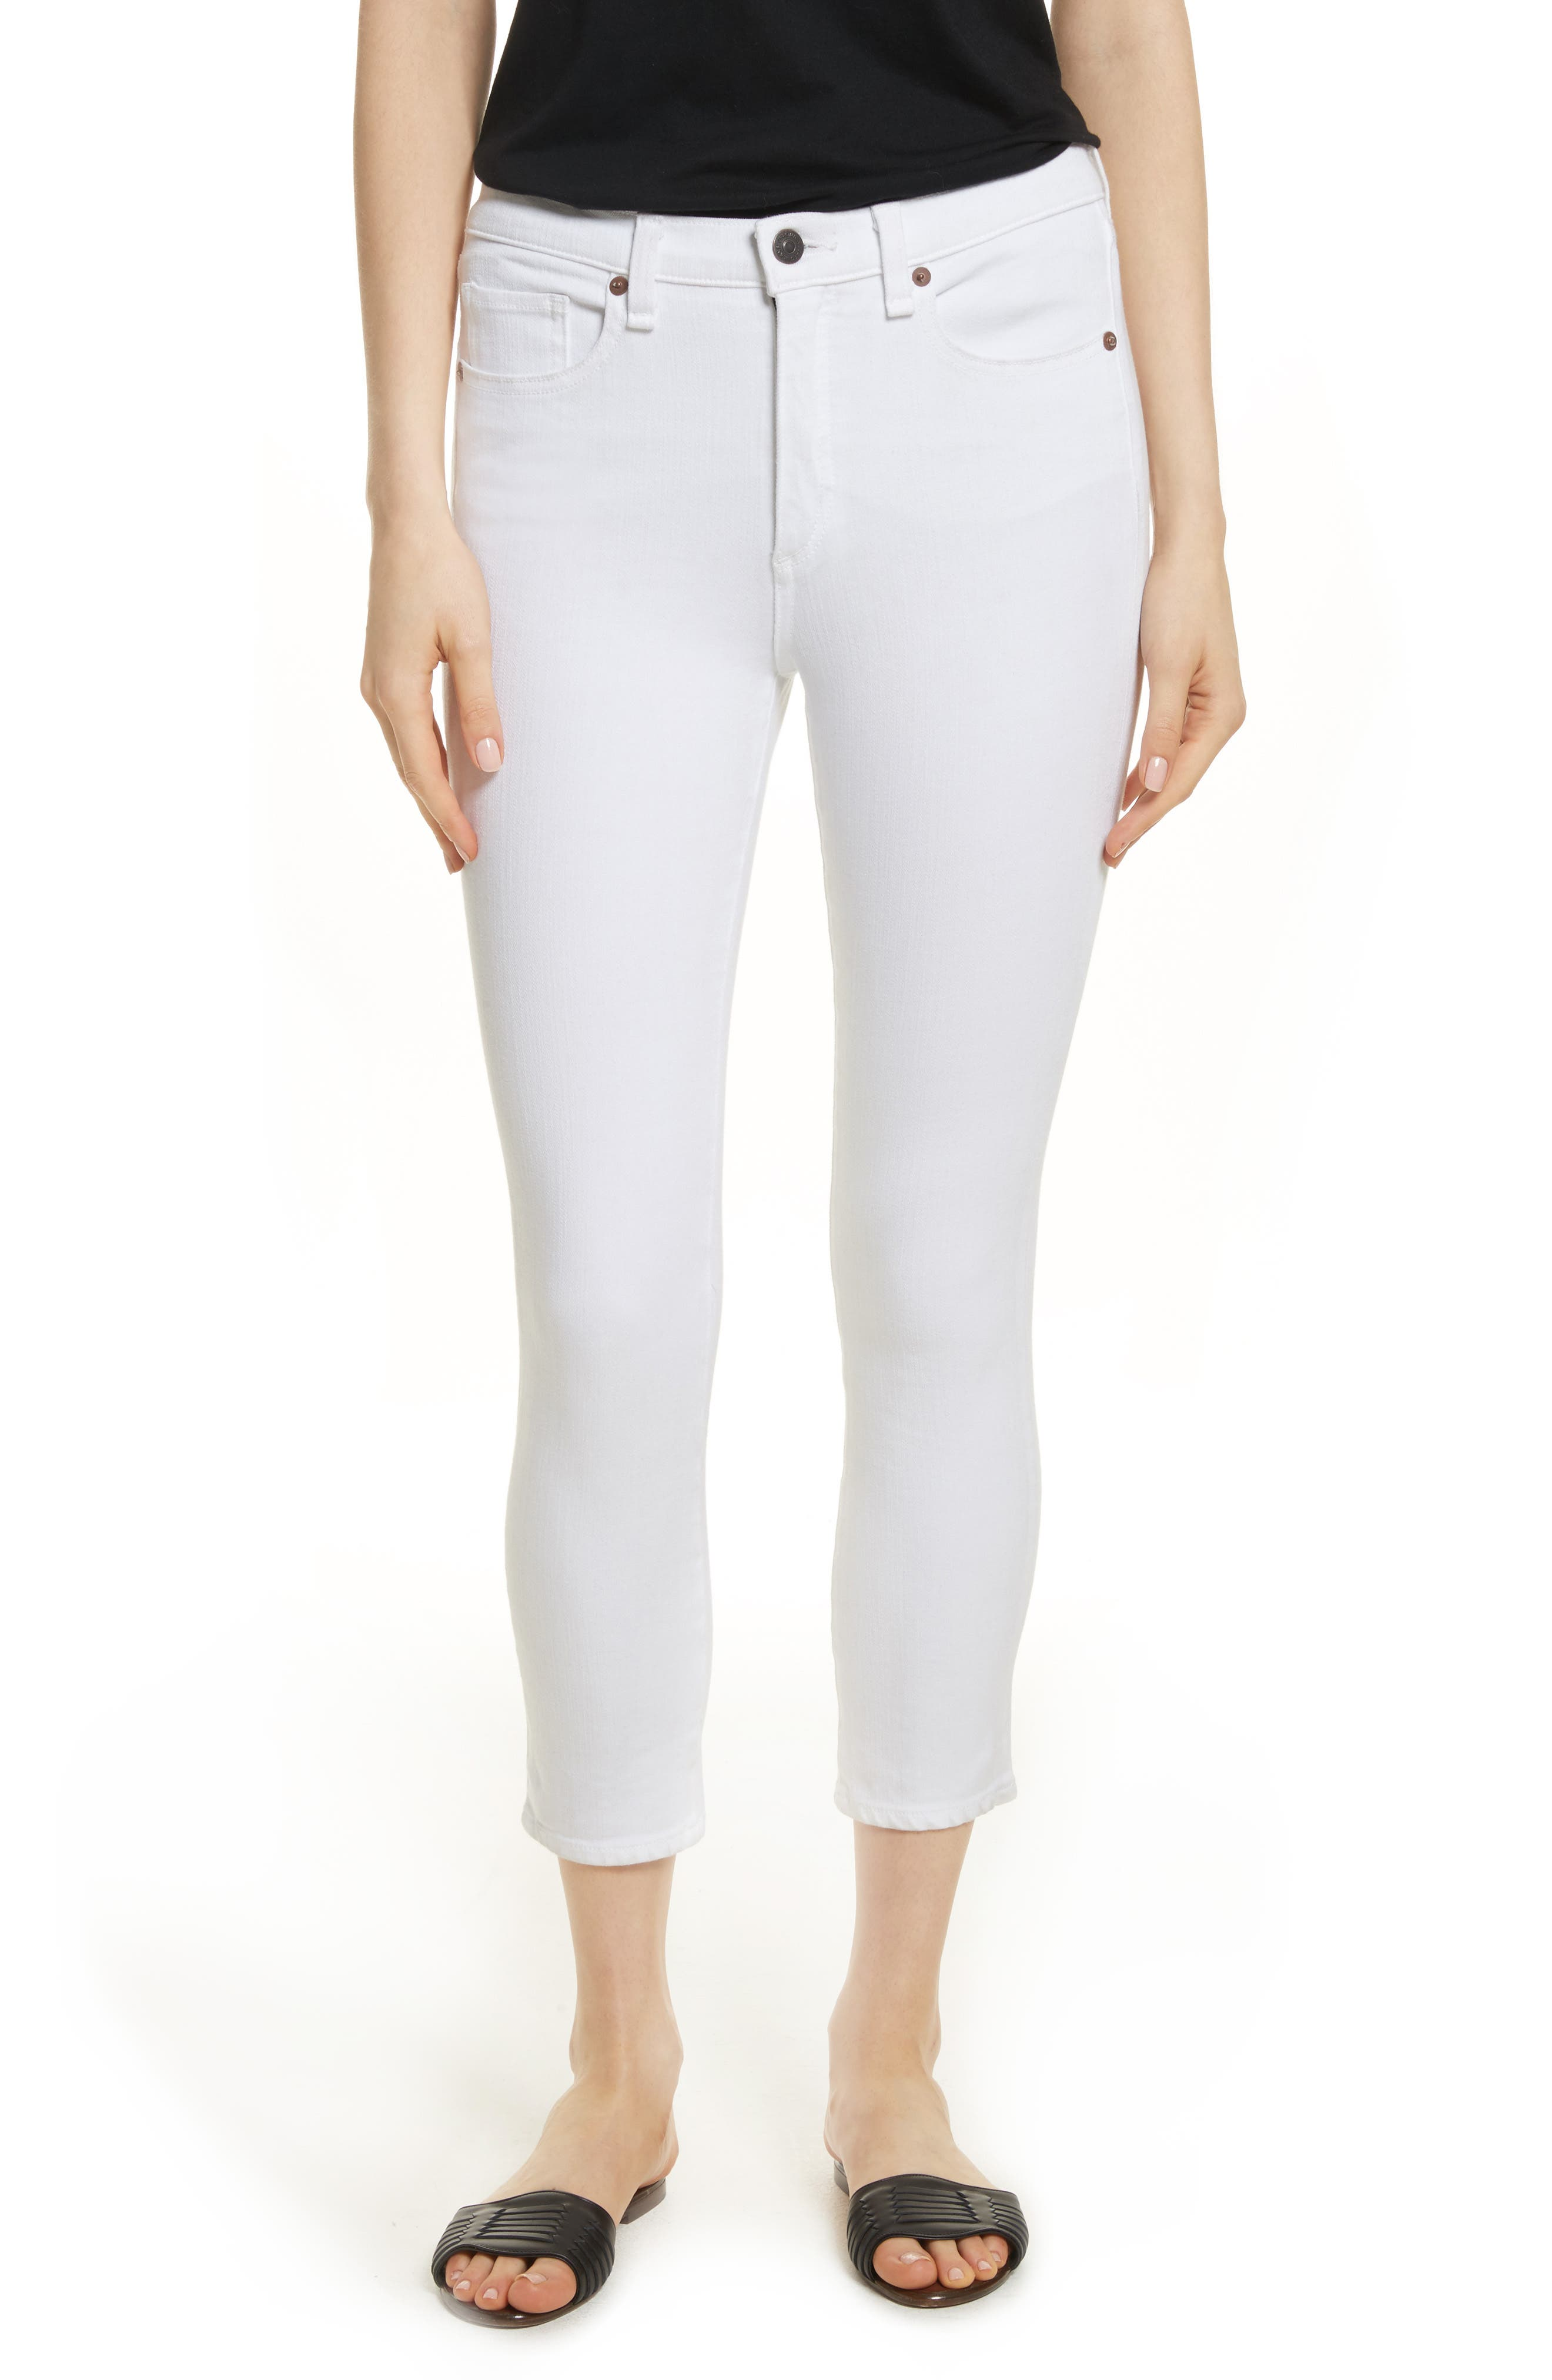 Veronica Beard Kate Capri Jeans